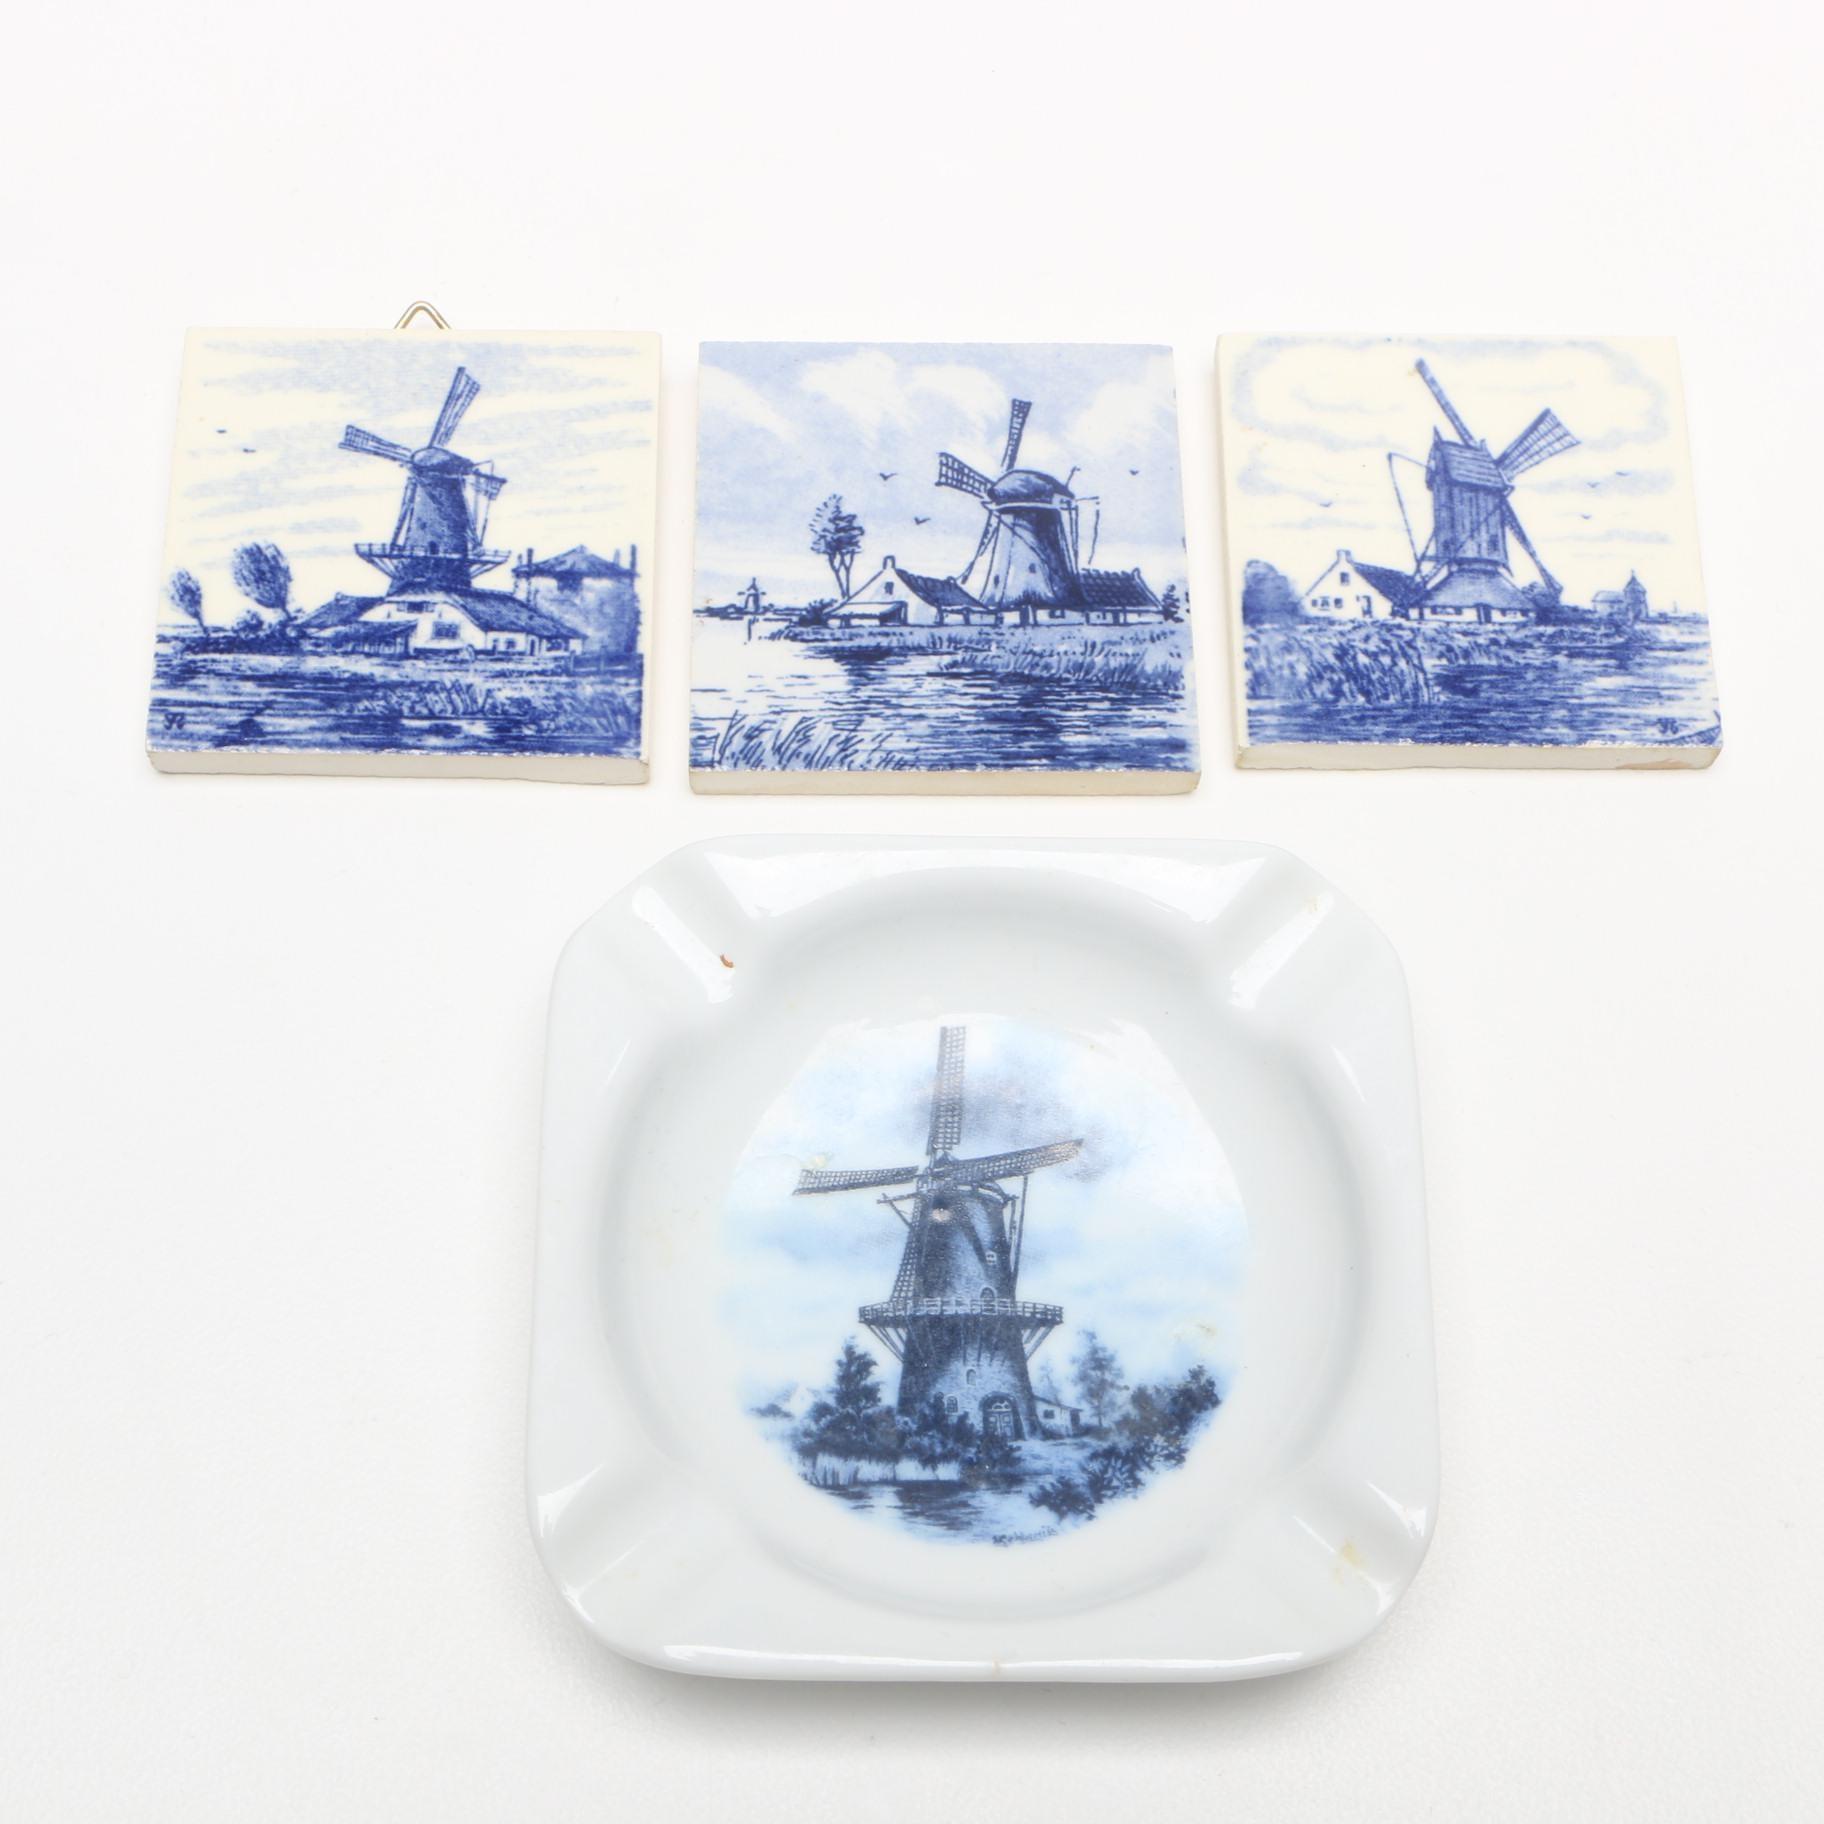 Delft Porcelain Ash Receiver and Tiles